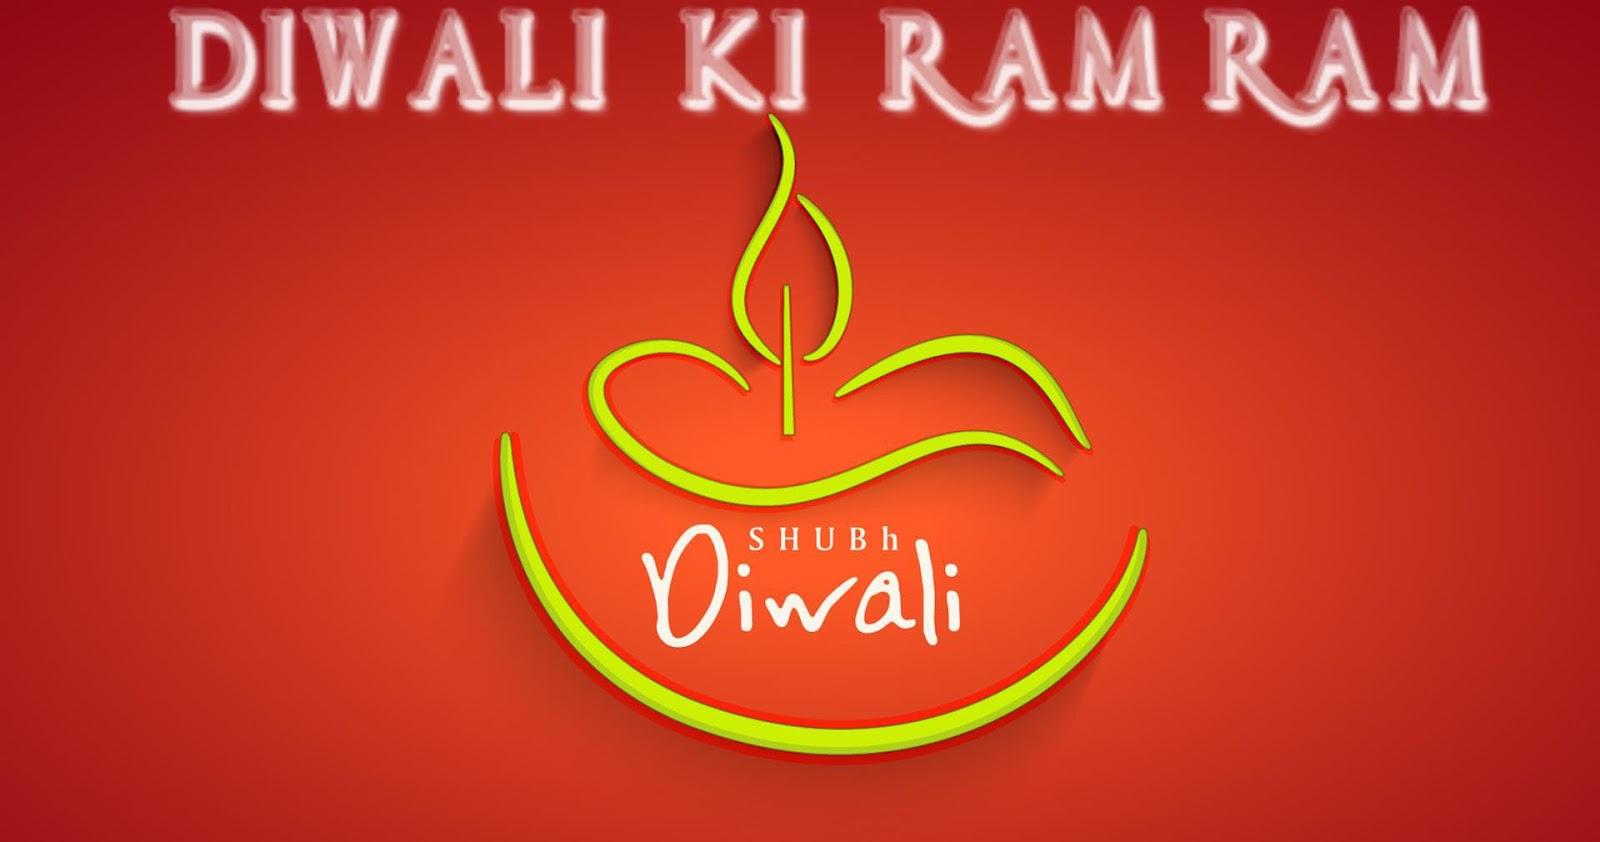 Diwali deepawali deepavali pictures with wishes messages happy diwali deepawali deepavali pictures with wishes messagesgreetings messages kristyandbryce Choice Image